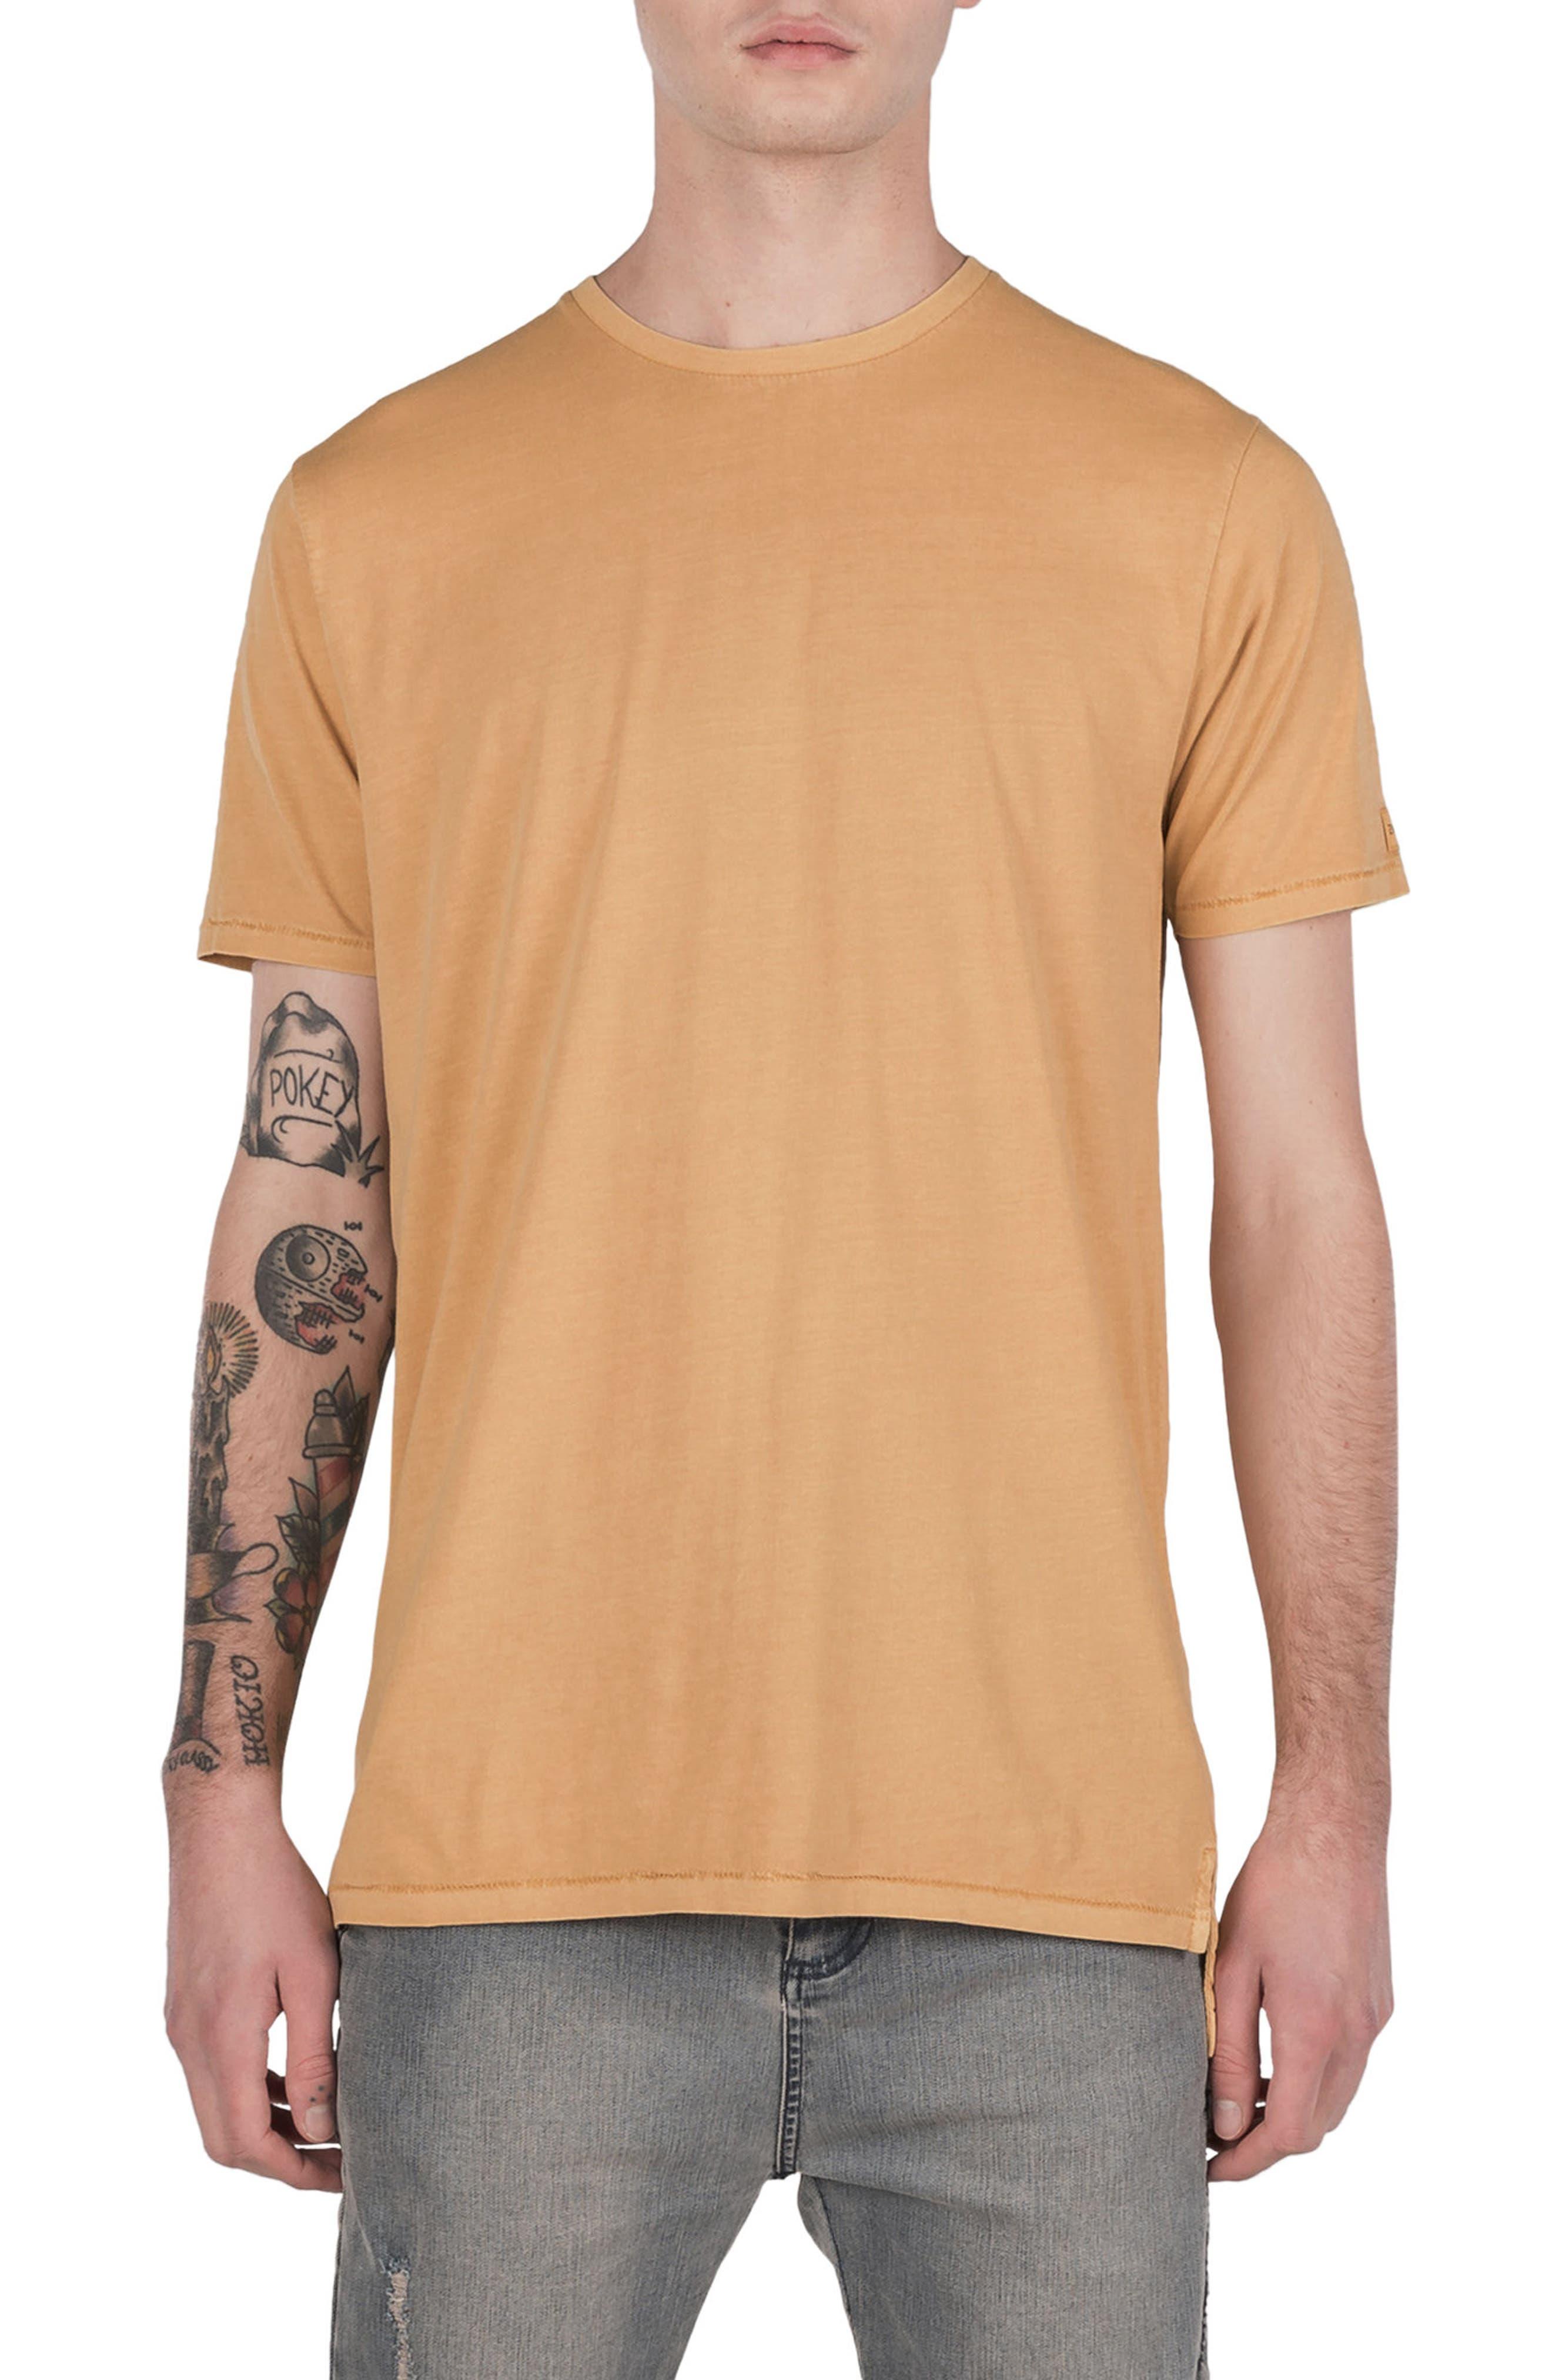 Flintlock T-Shirt,                             Main thumbnail 1, color,                             800